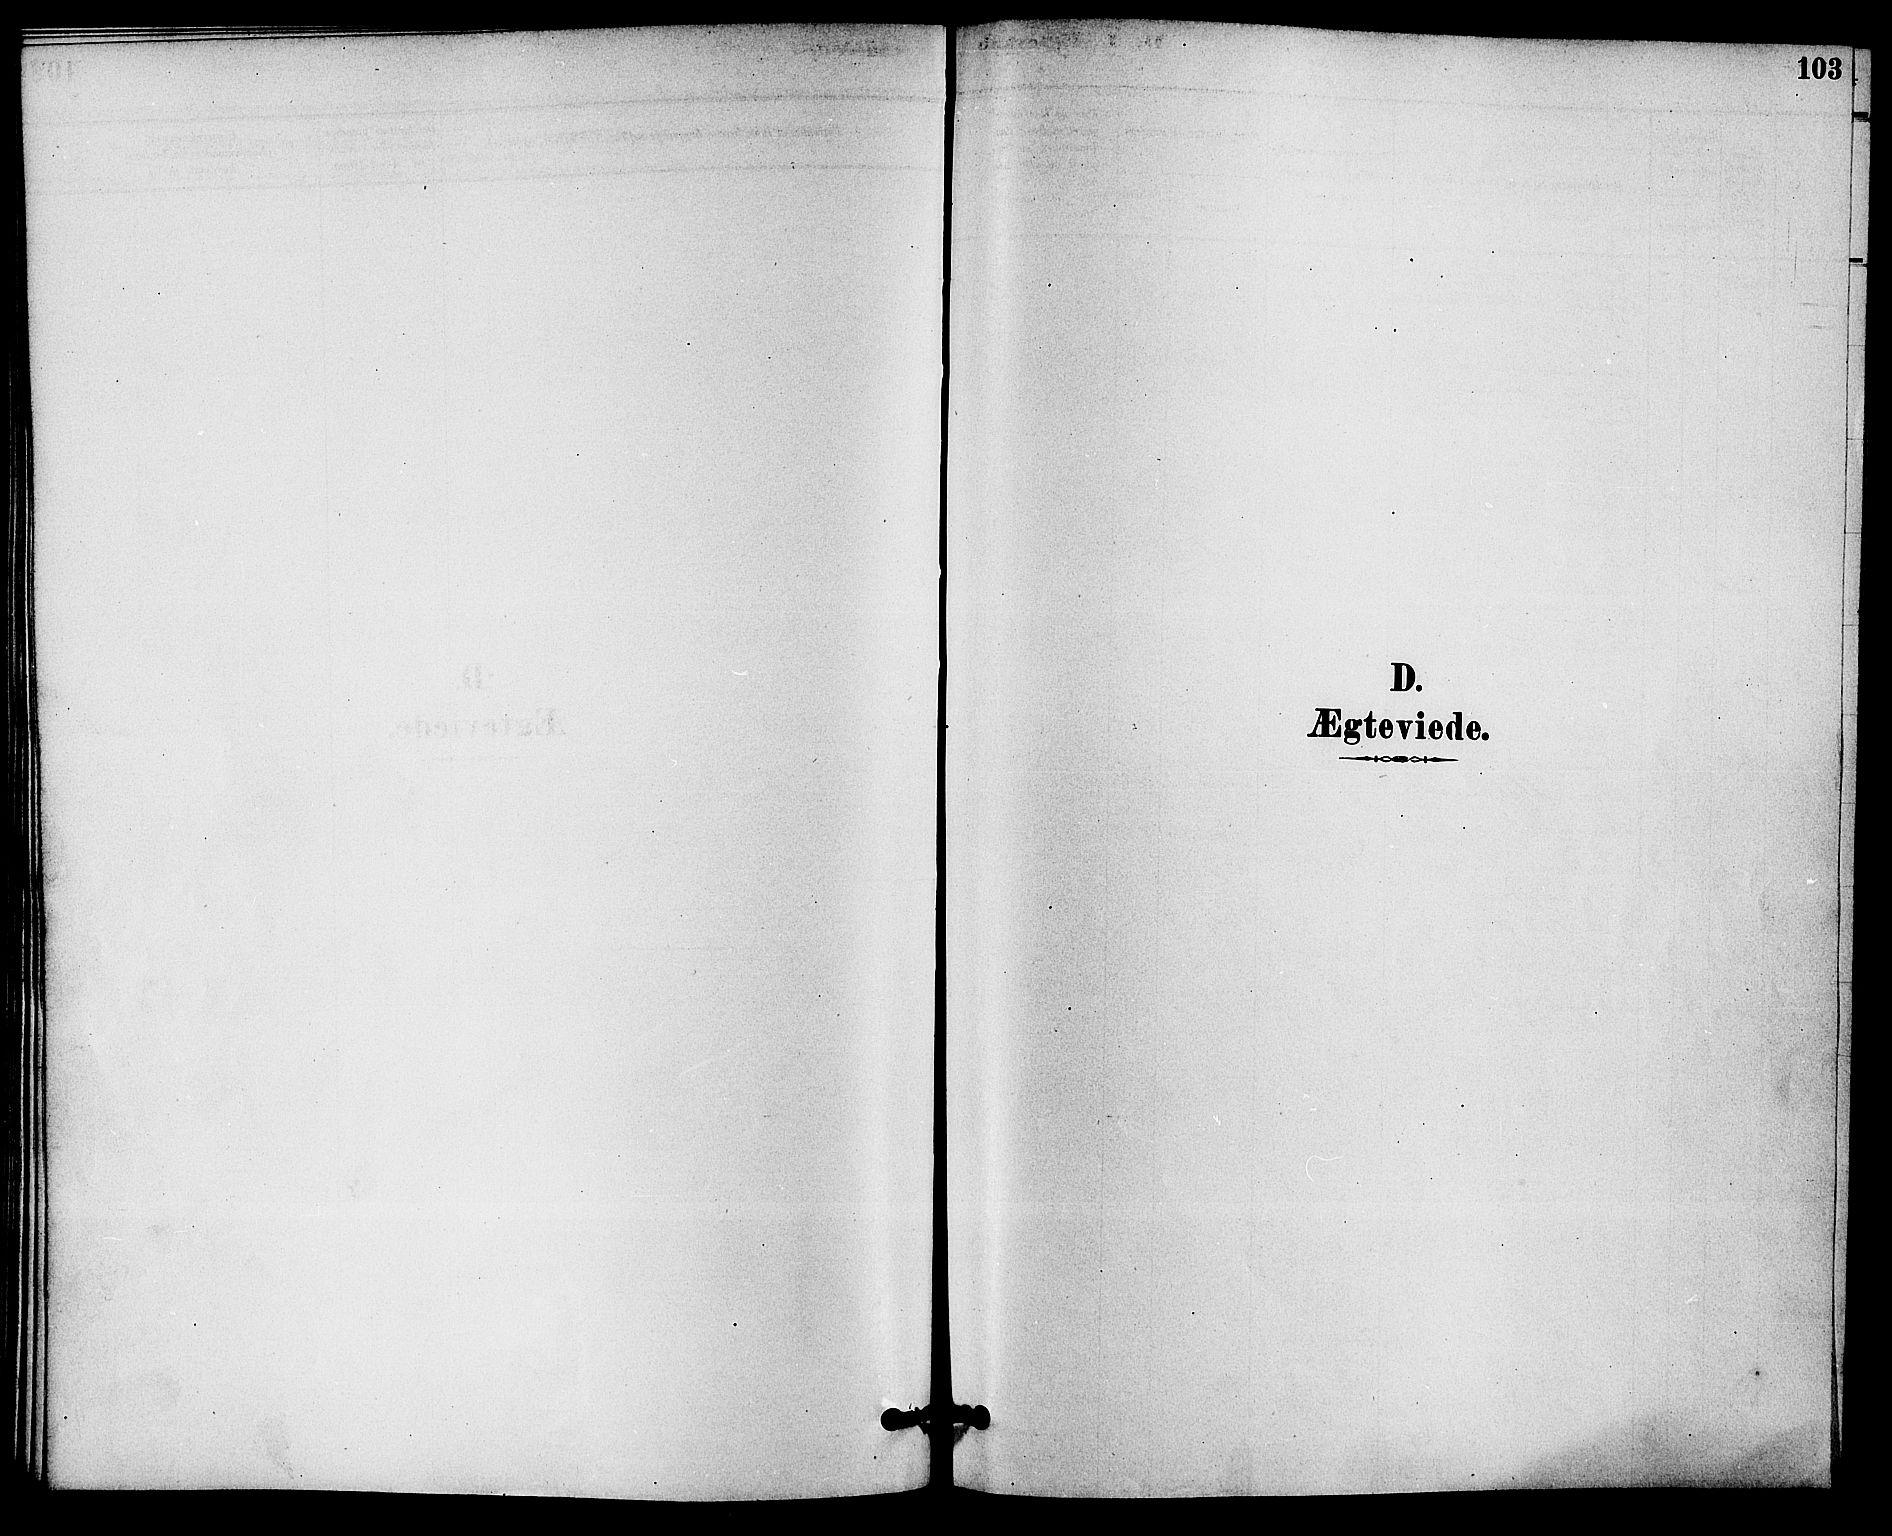 SAKO, Solum kirkebøker, F/Fb/L0001: Ministerialbok nr. II 1, 1877-1892, s. 103